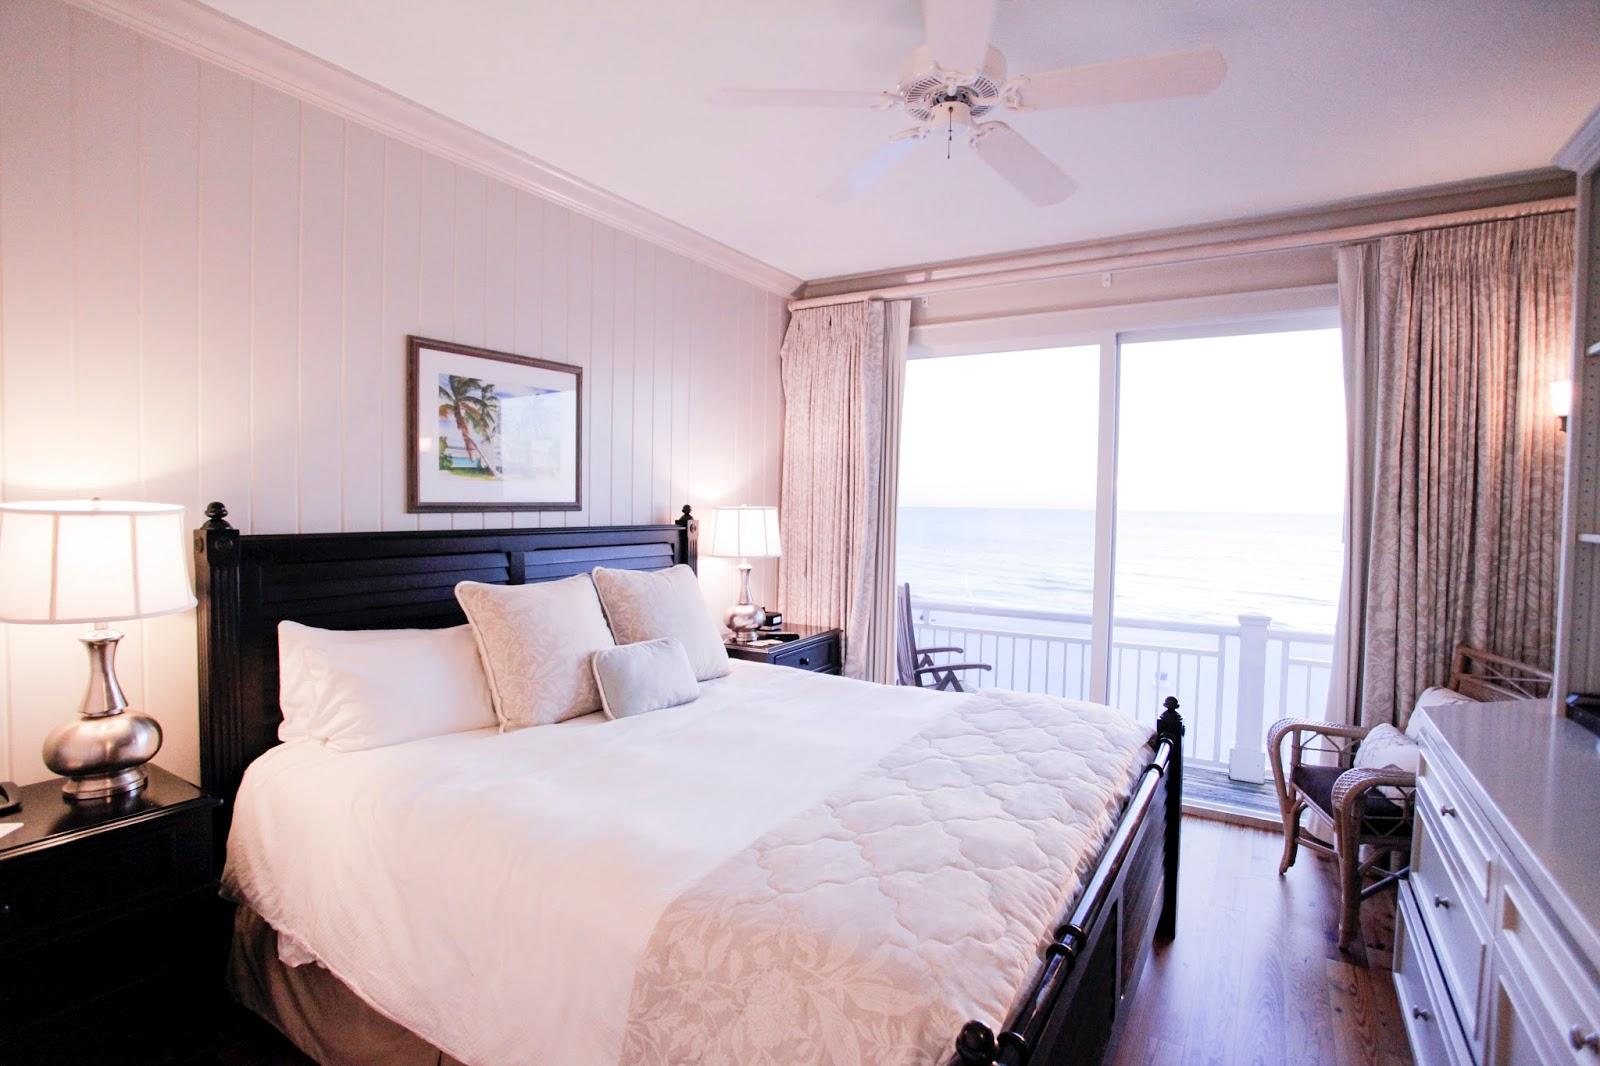 Master room of three bedroom vacation rental at Mainsail Beach Inn in Anna Maria Island